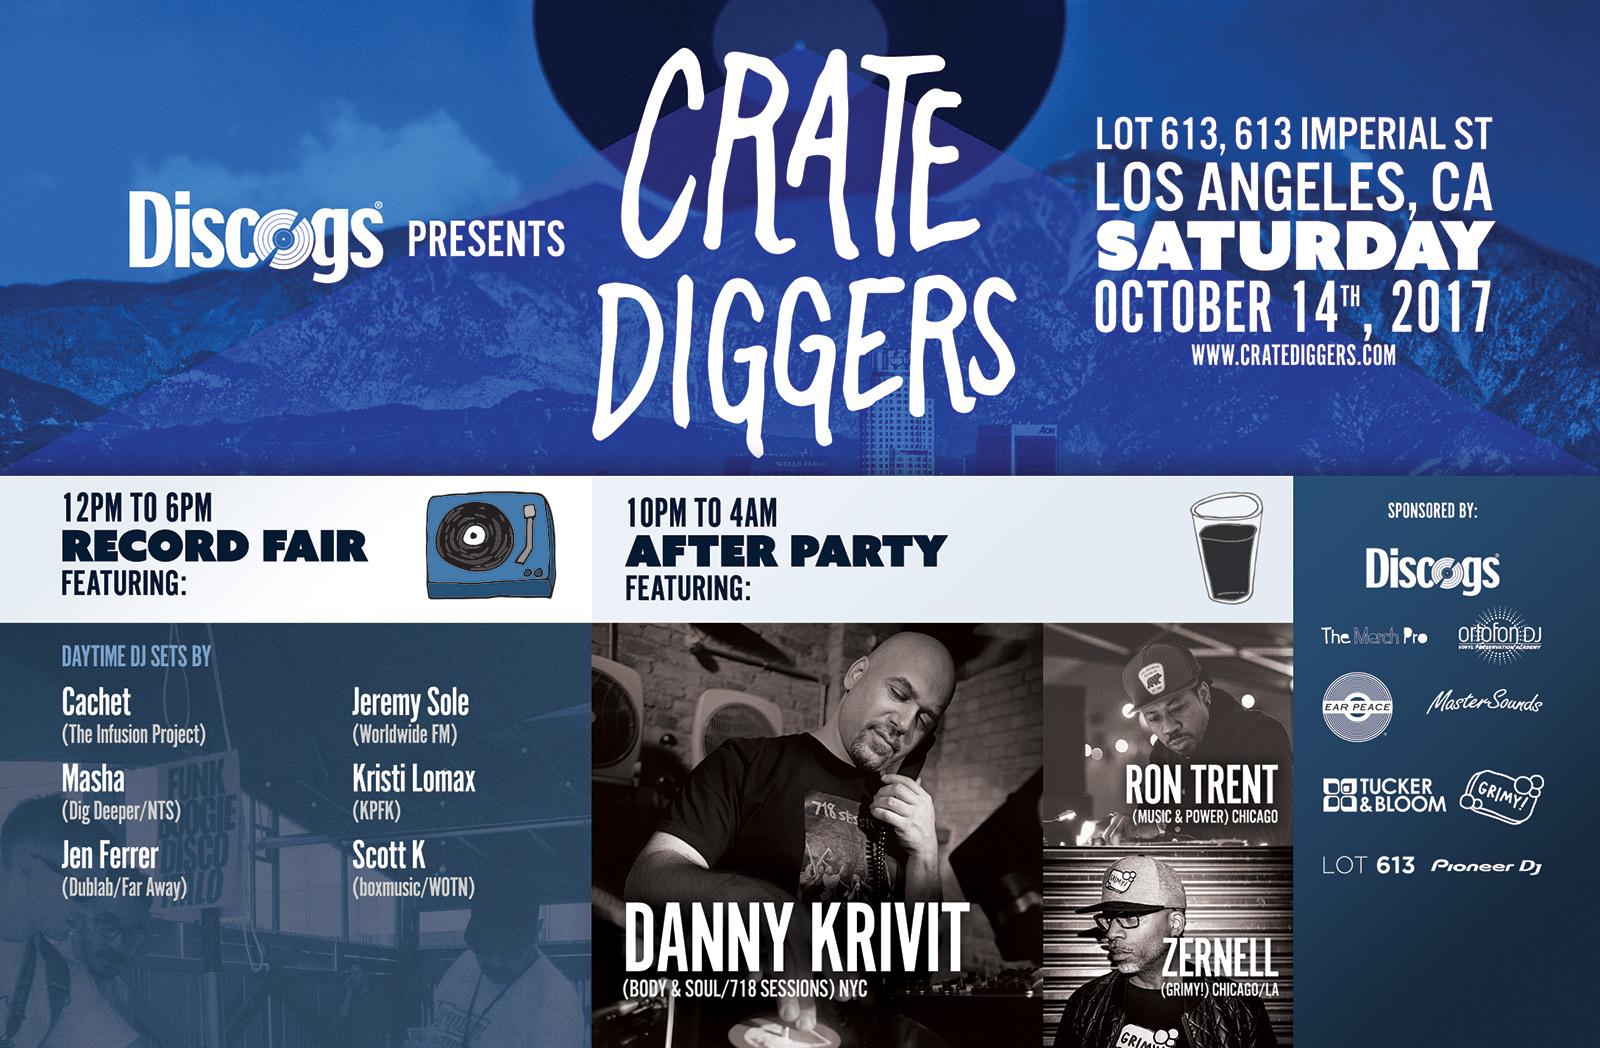 Crate Diggers LA promo poster